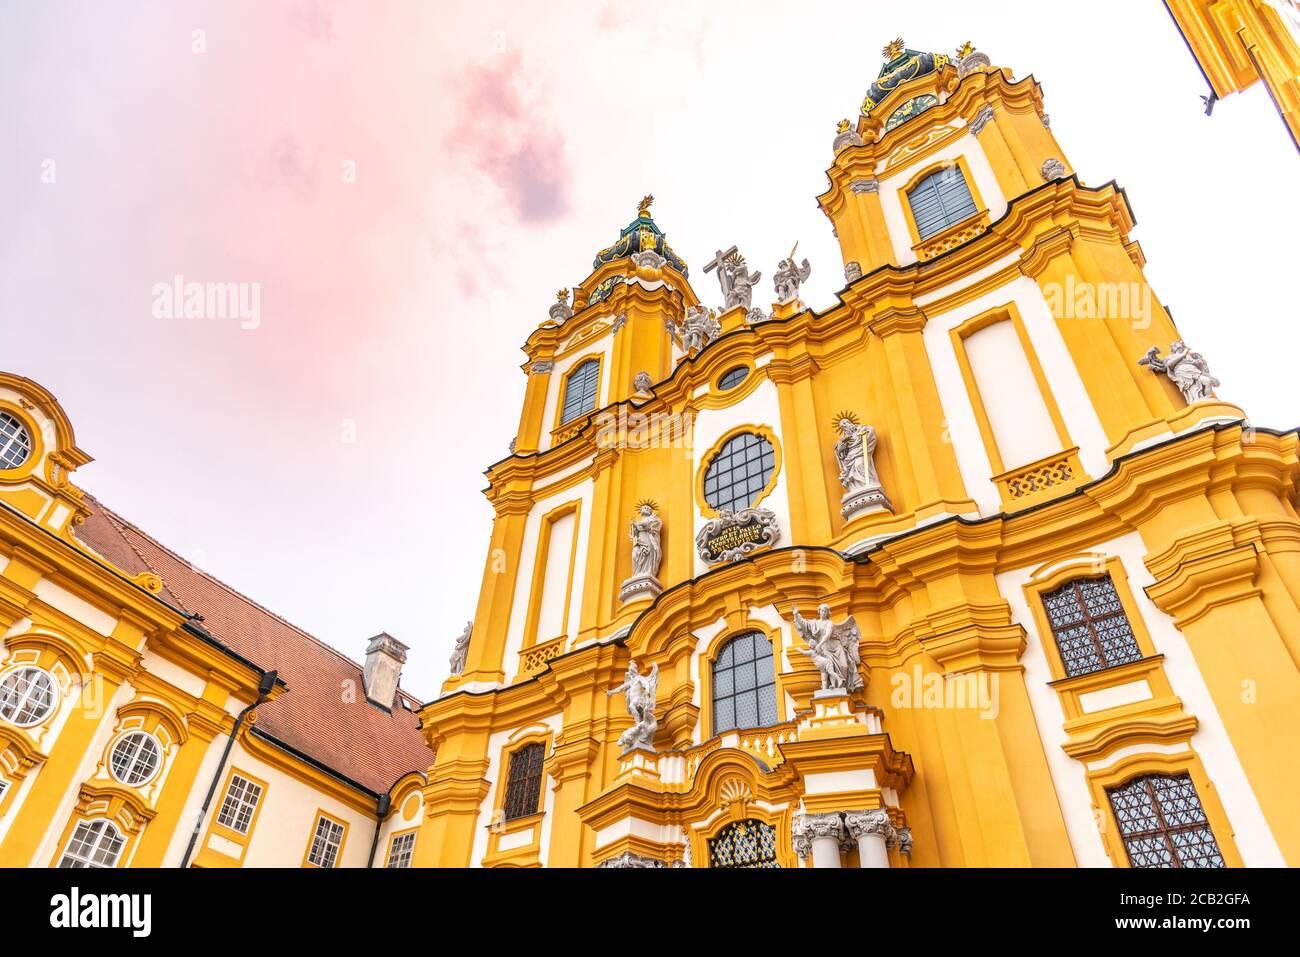 Melk Abbey Church. Main portal with two towers. Melk, Austria. Stock Photo